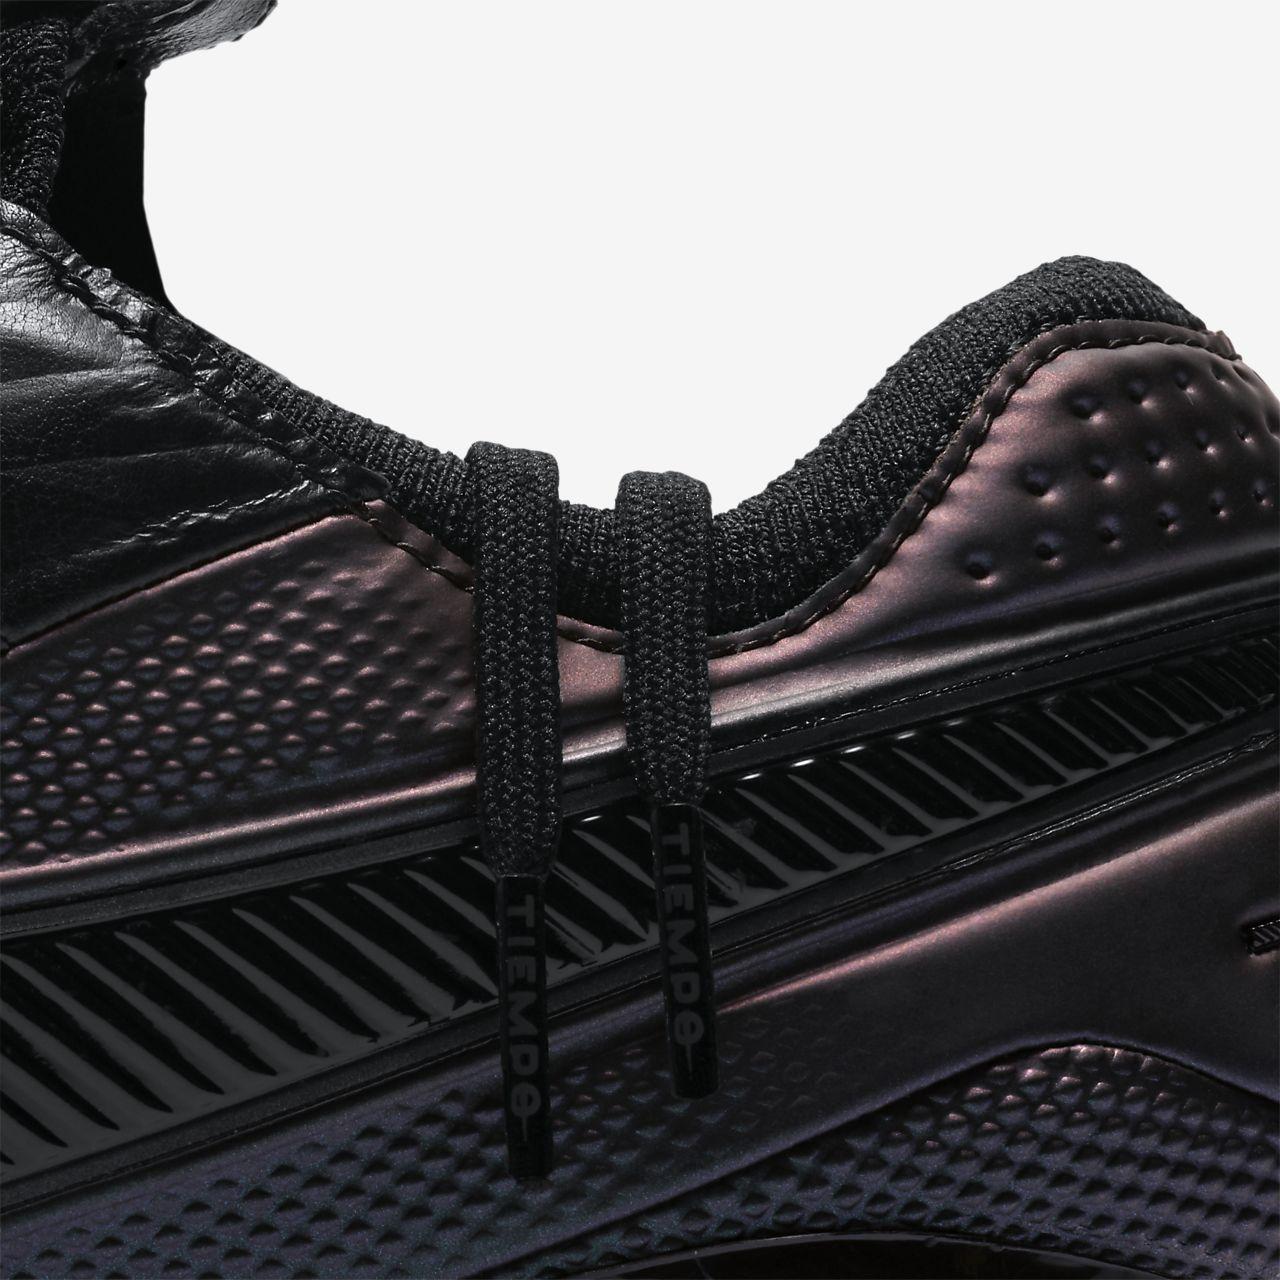 Nike Legend Training Shoes | Training | Flywire Technology